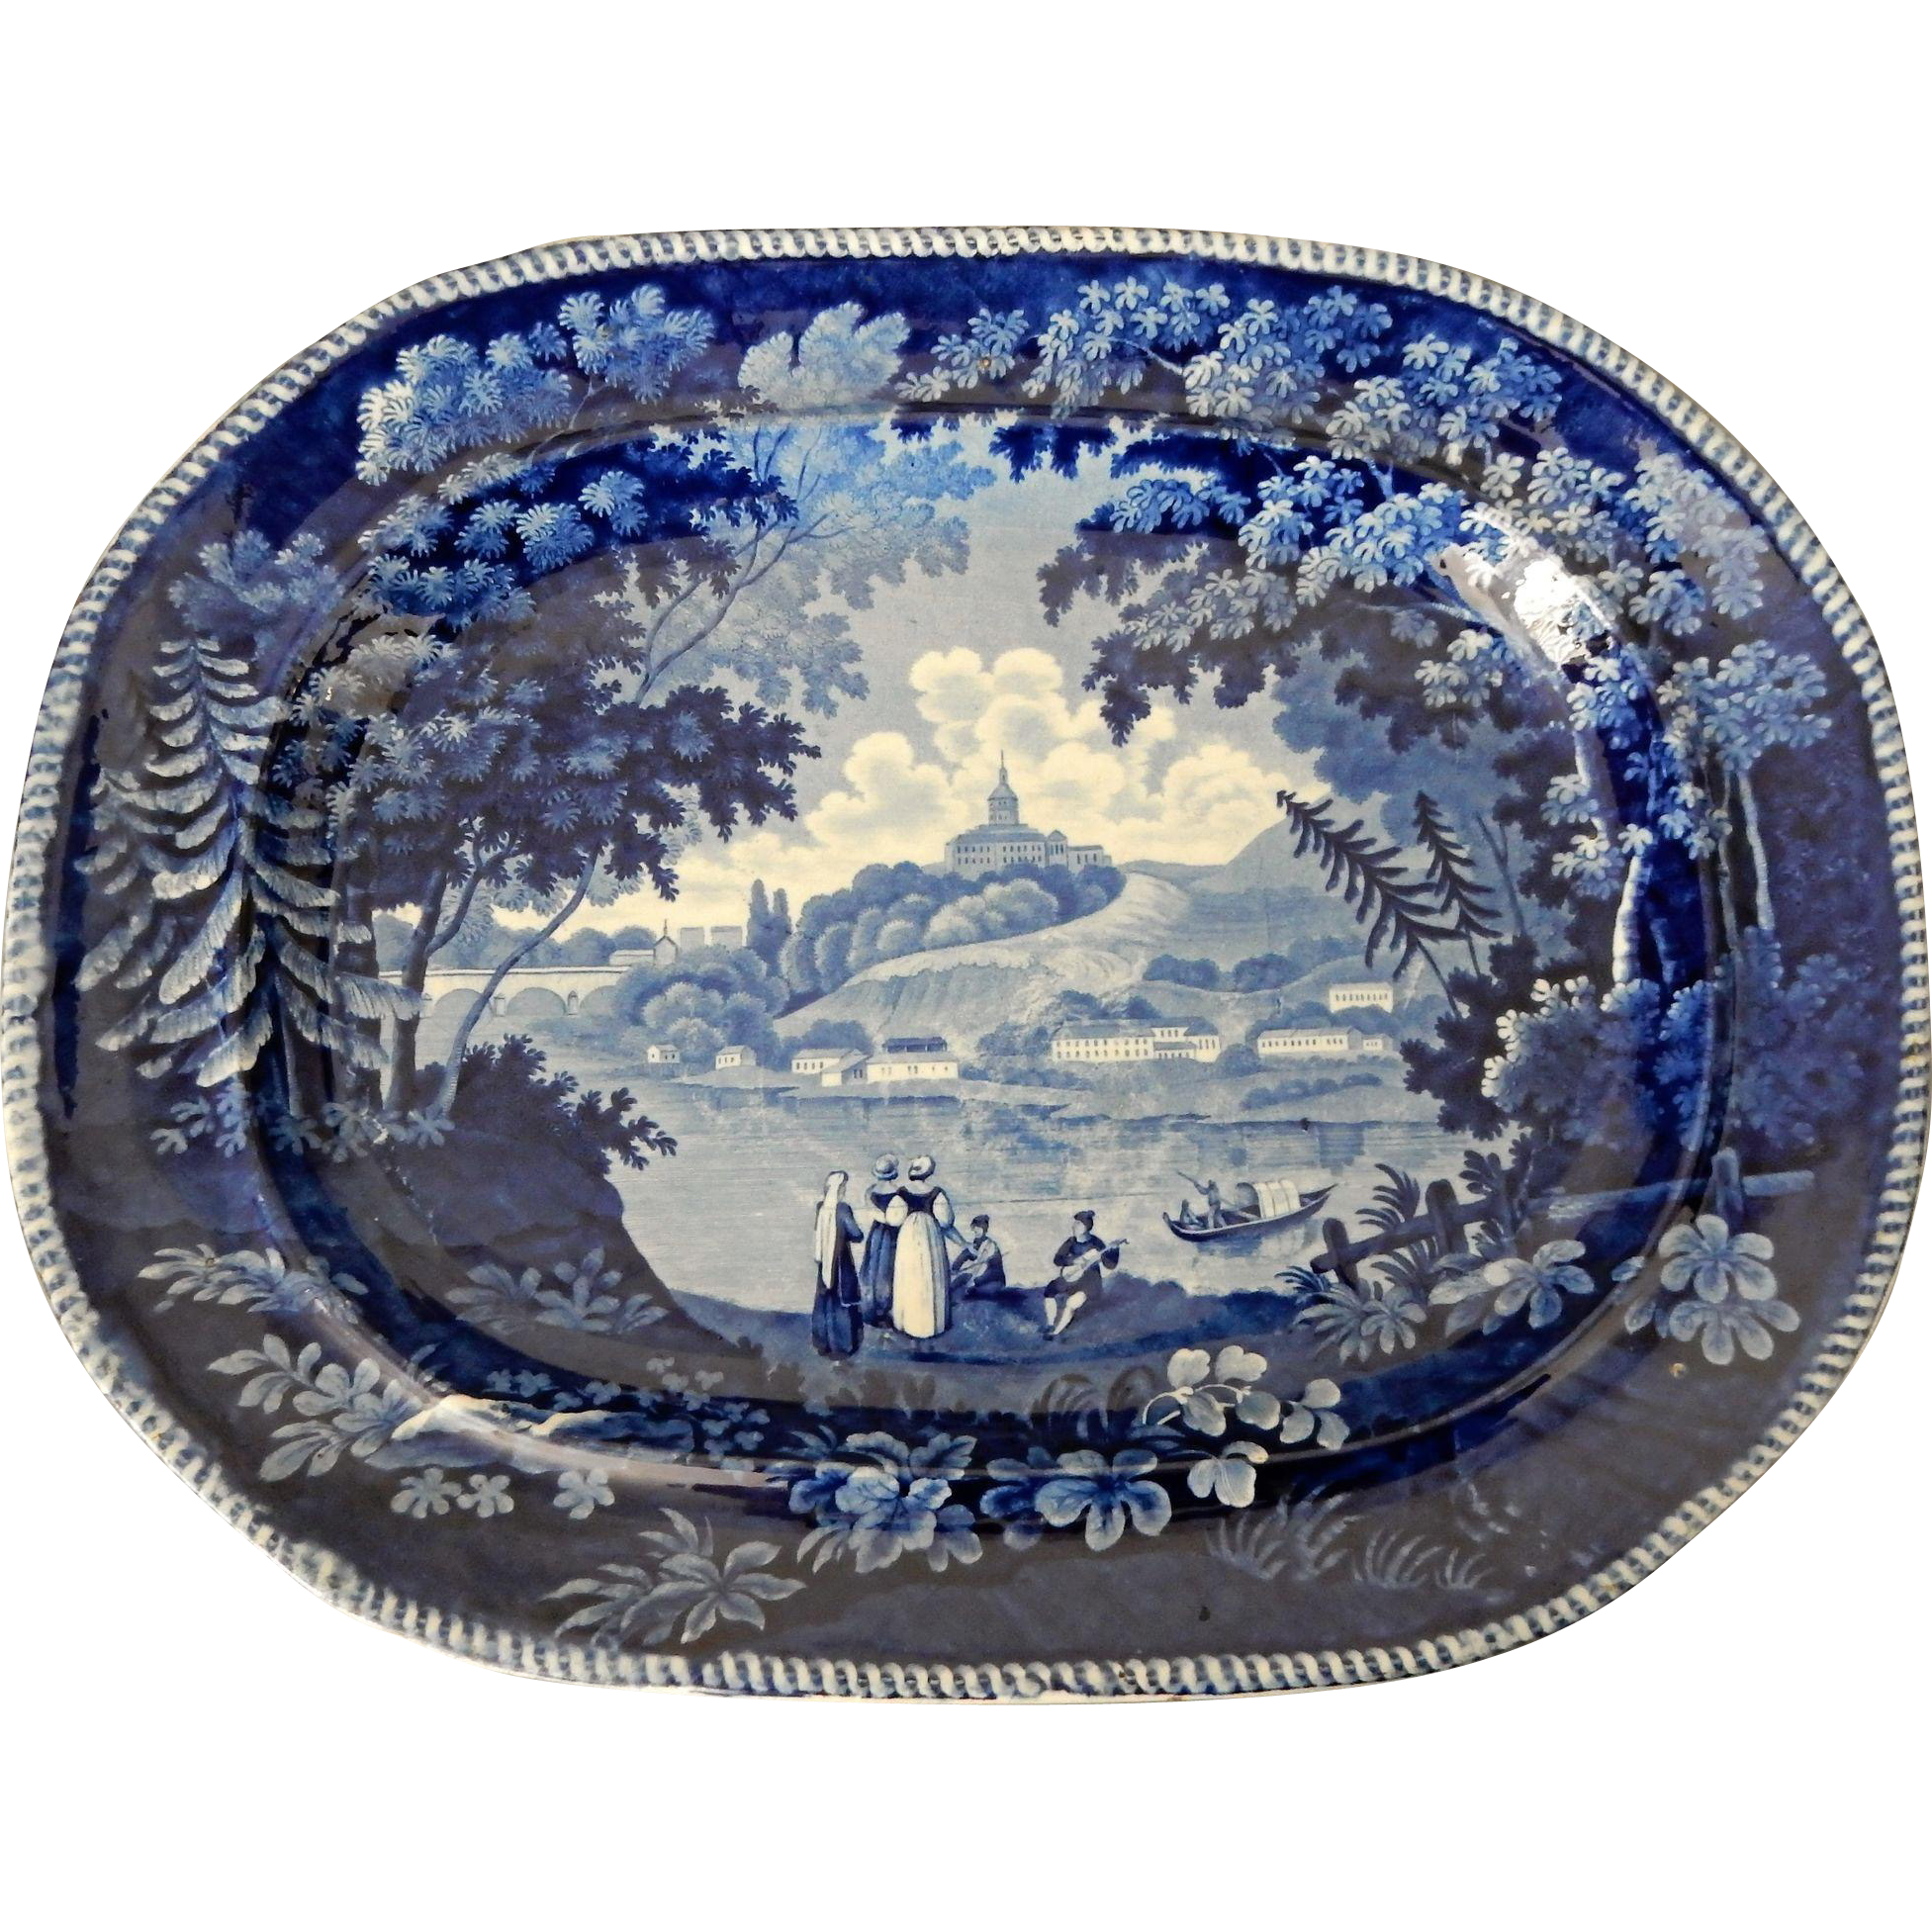 Large Blue \u0026 White Transferware Platter \ Italian Scenery Turin\  by  William Ash Antiques | Ruby Lane  sc 1 st  Ruby Lane & Large Blue \u0026 White Transferware Platter \